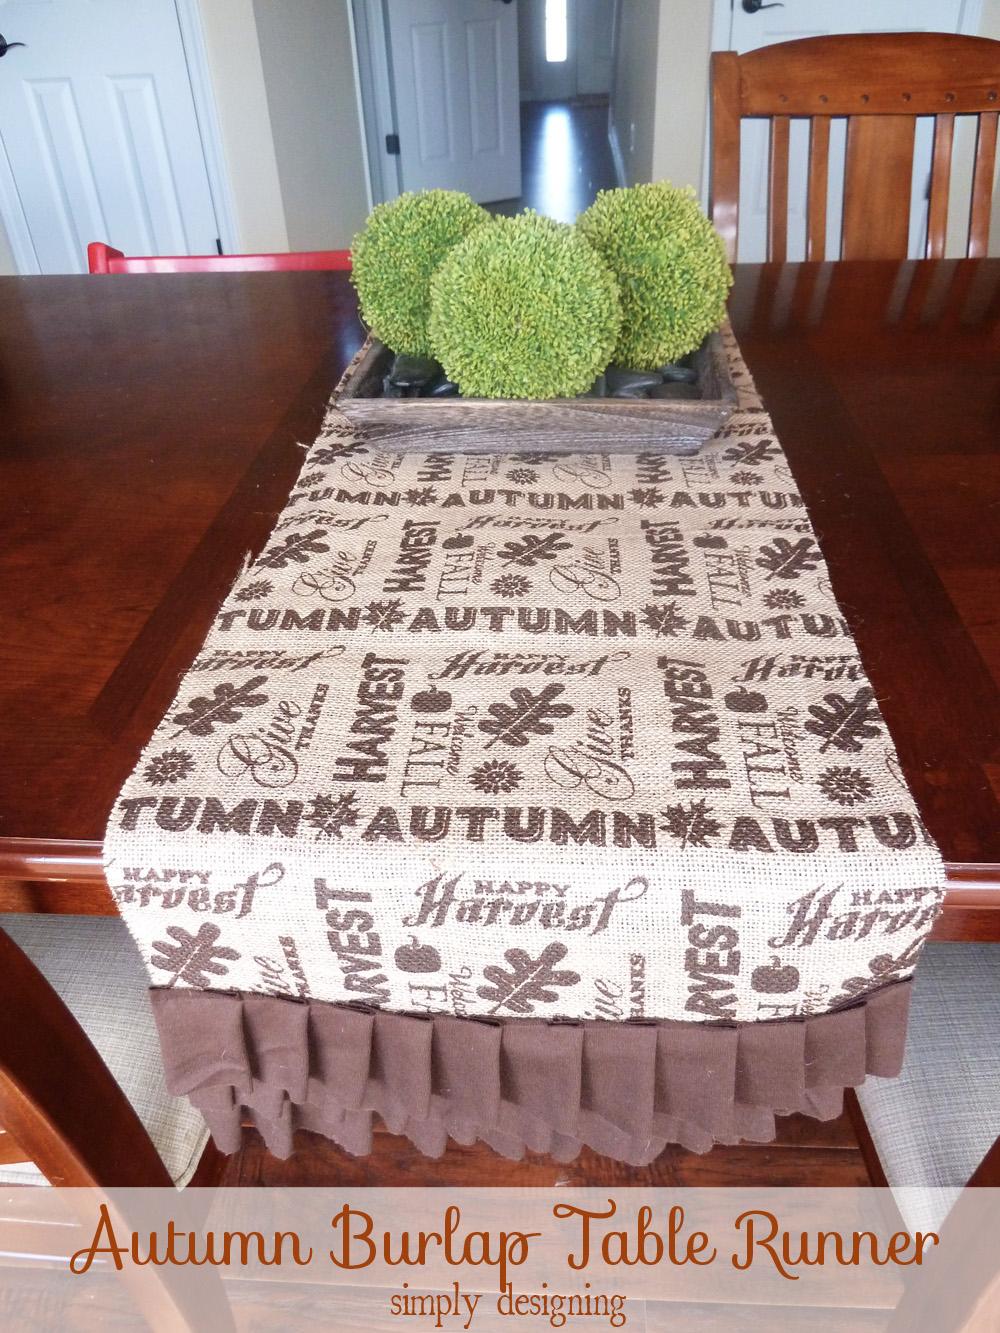 Burlap Table Runner | Perfect Fall Or Thanksgiving Table Decor For A  Tablescape | #falldecor